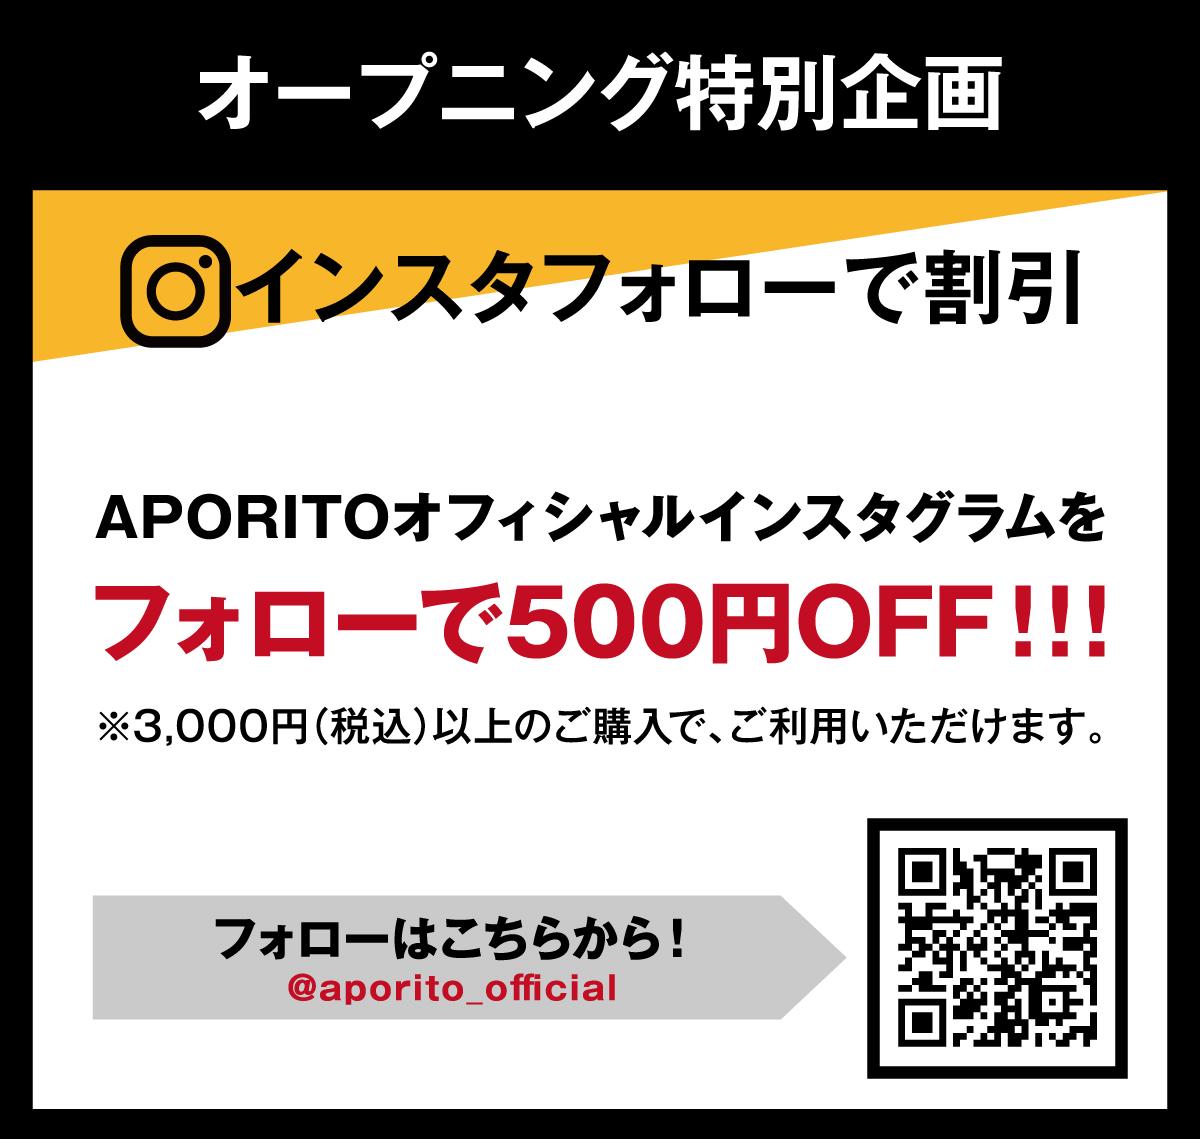 APyokohama_web3